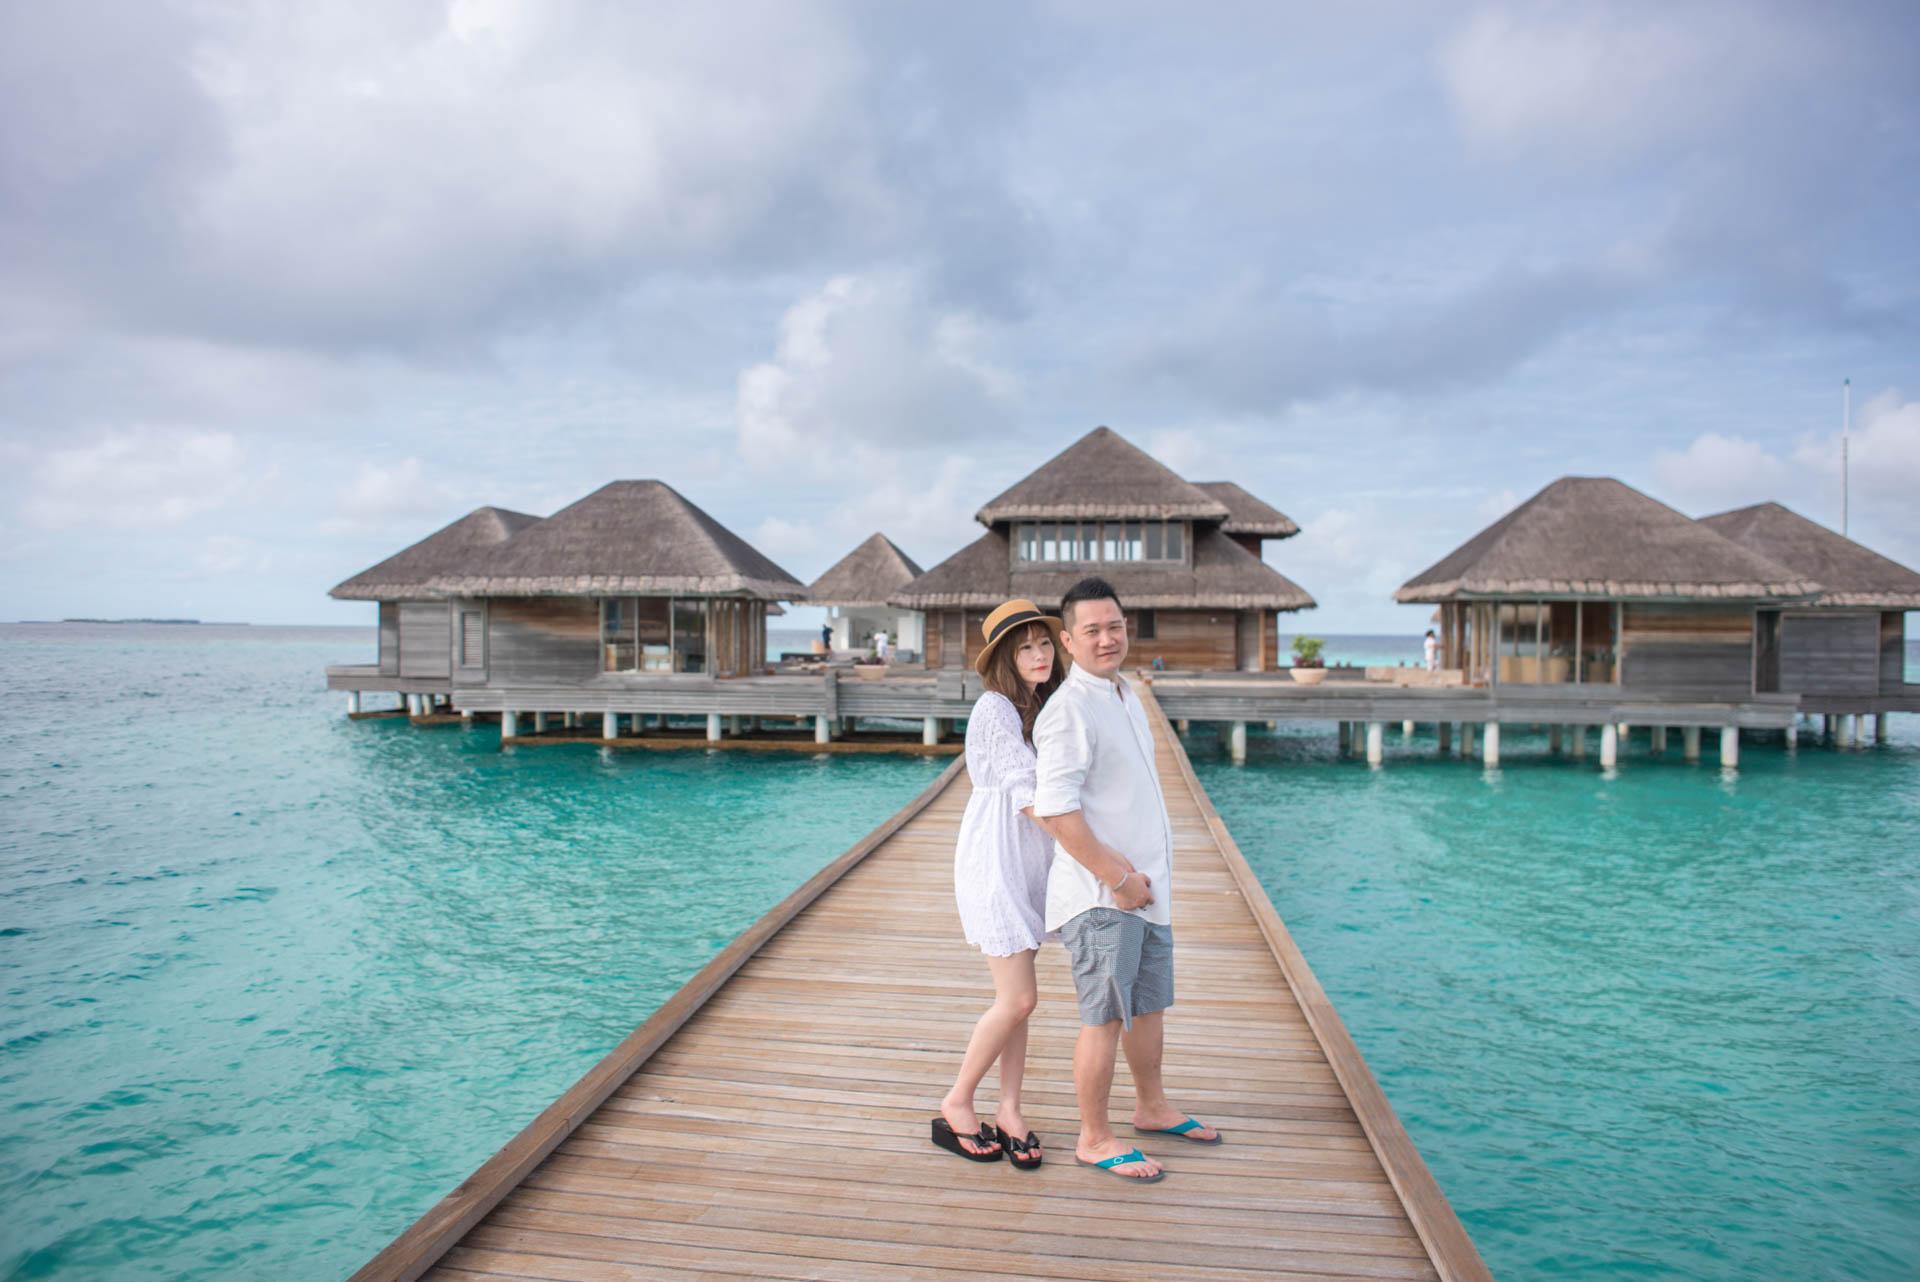 Chin Siew and Chin Yee Honeymoon in Maldives at Huvafen Fushi Resort Under Water Spa 16